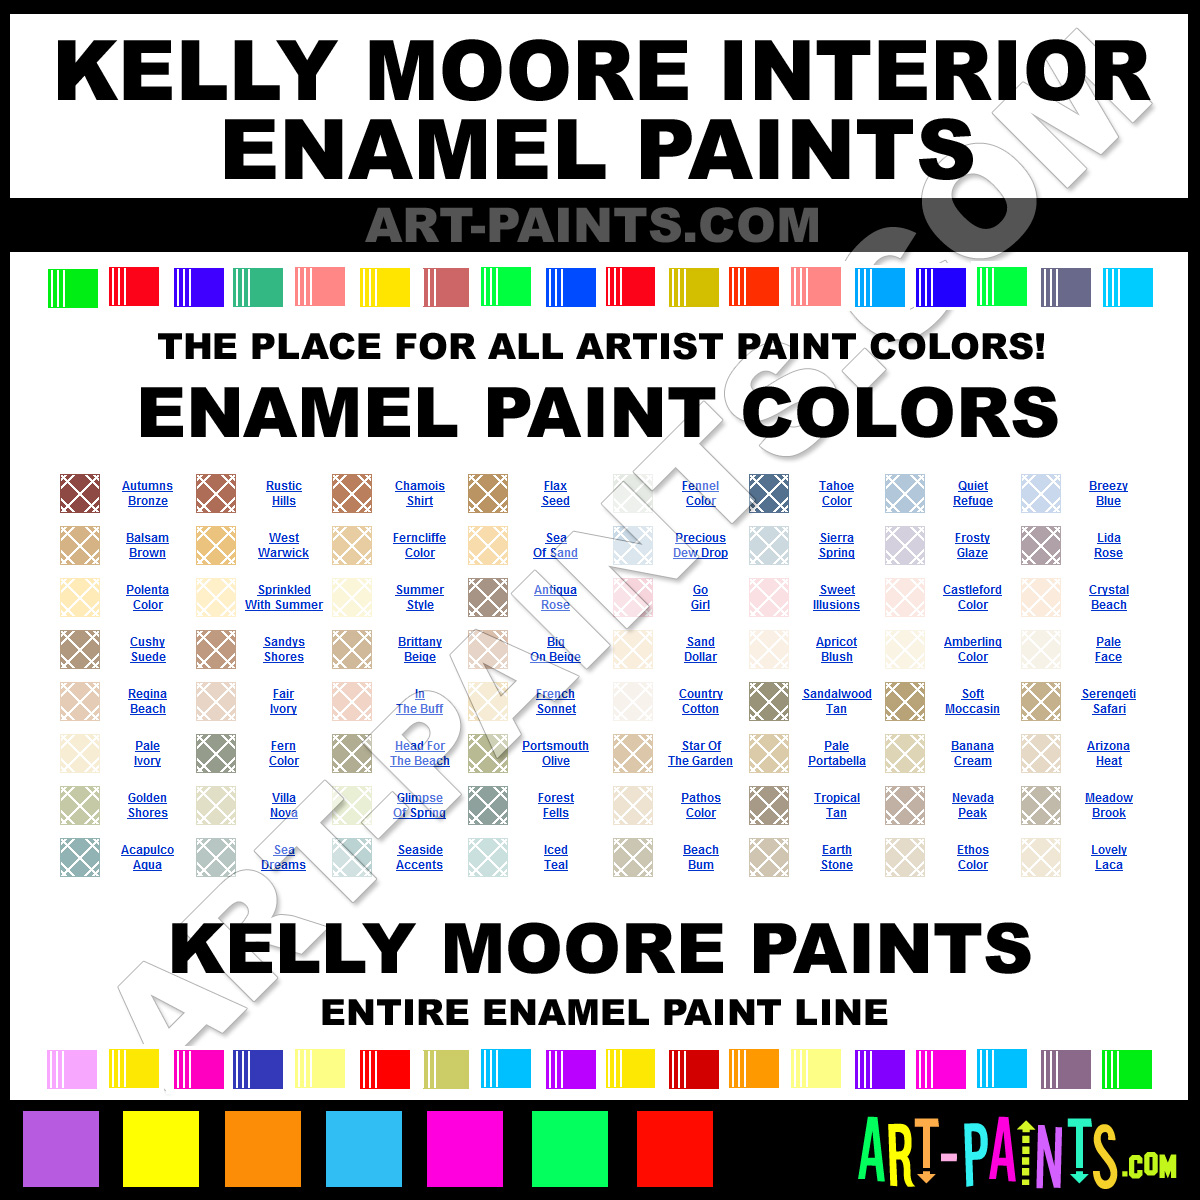 kelly moore interior enamel paint colors kelly moore. Black Bedroom Furniture Sets. Home Design Ideas